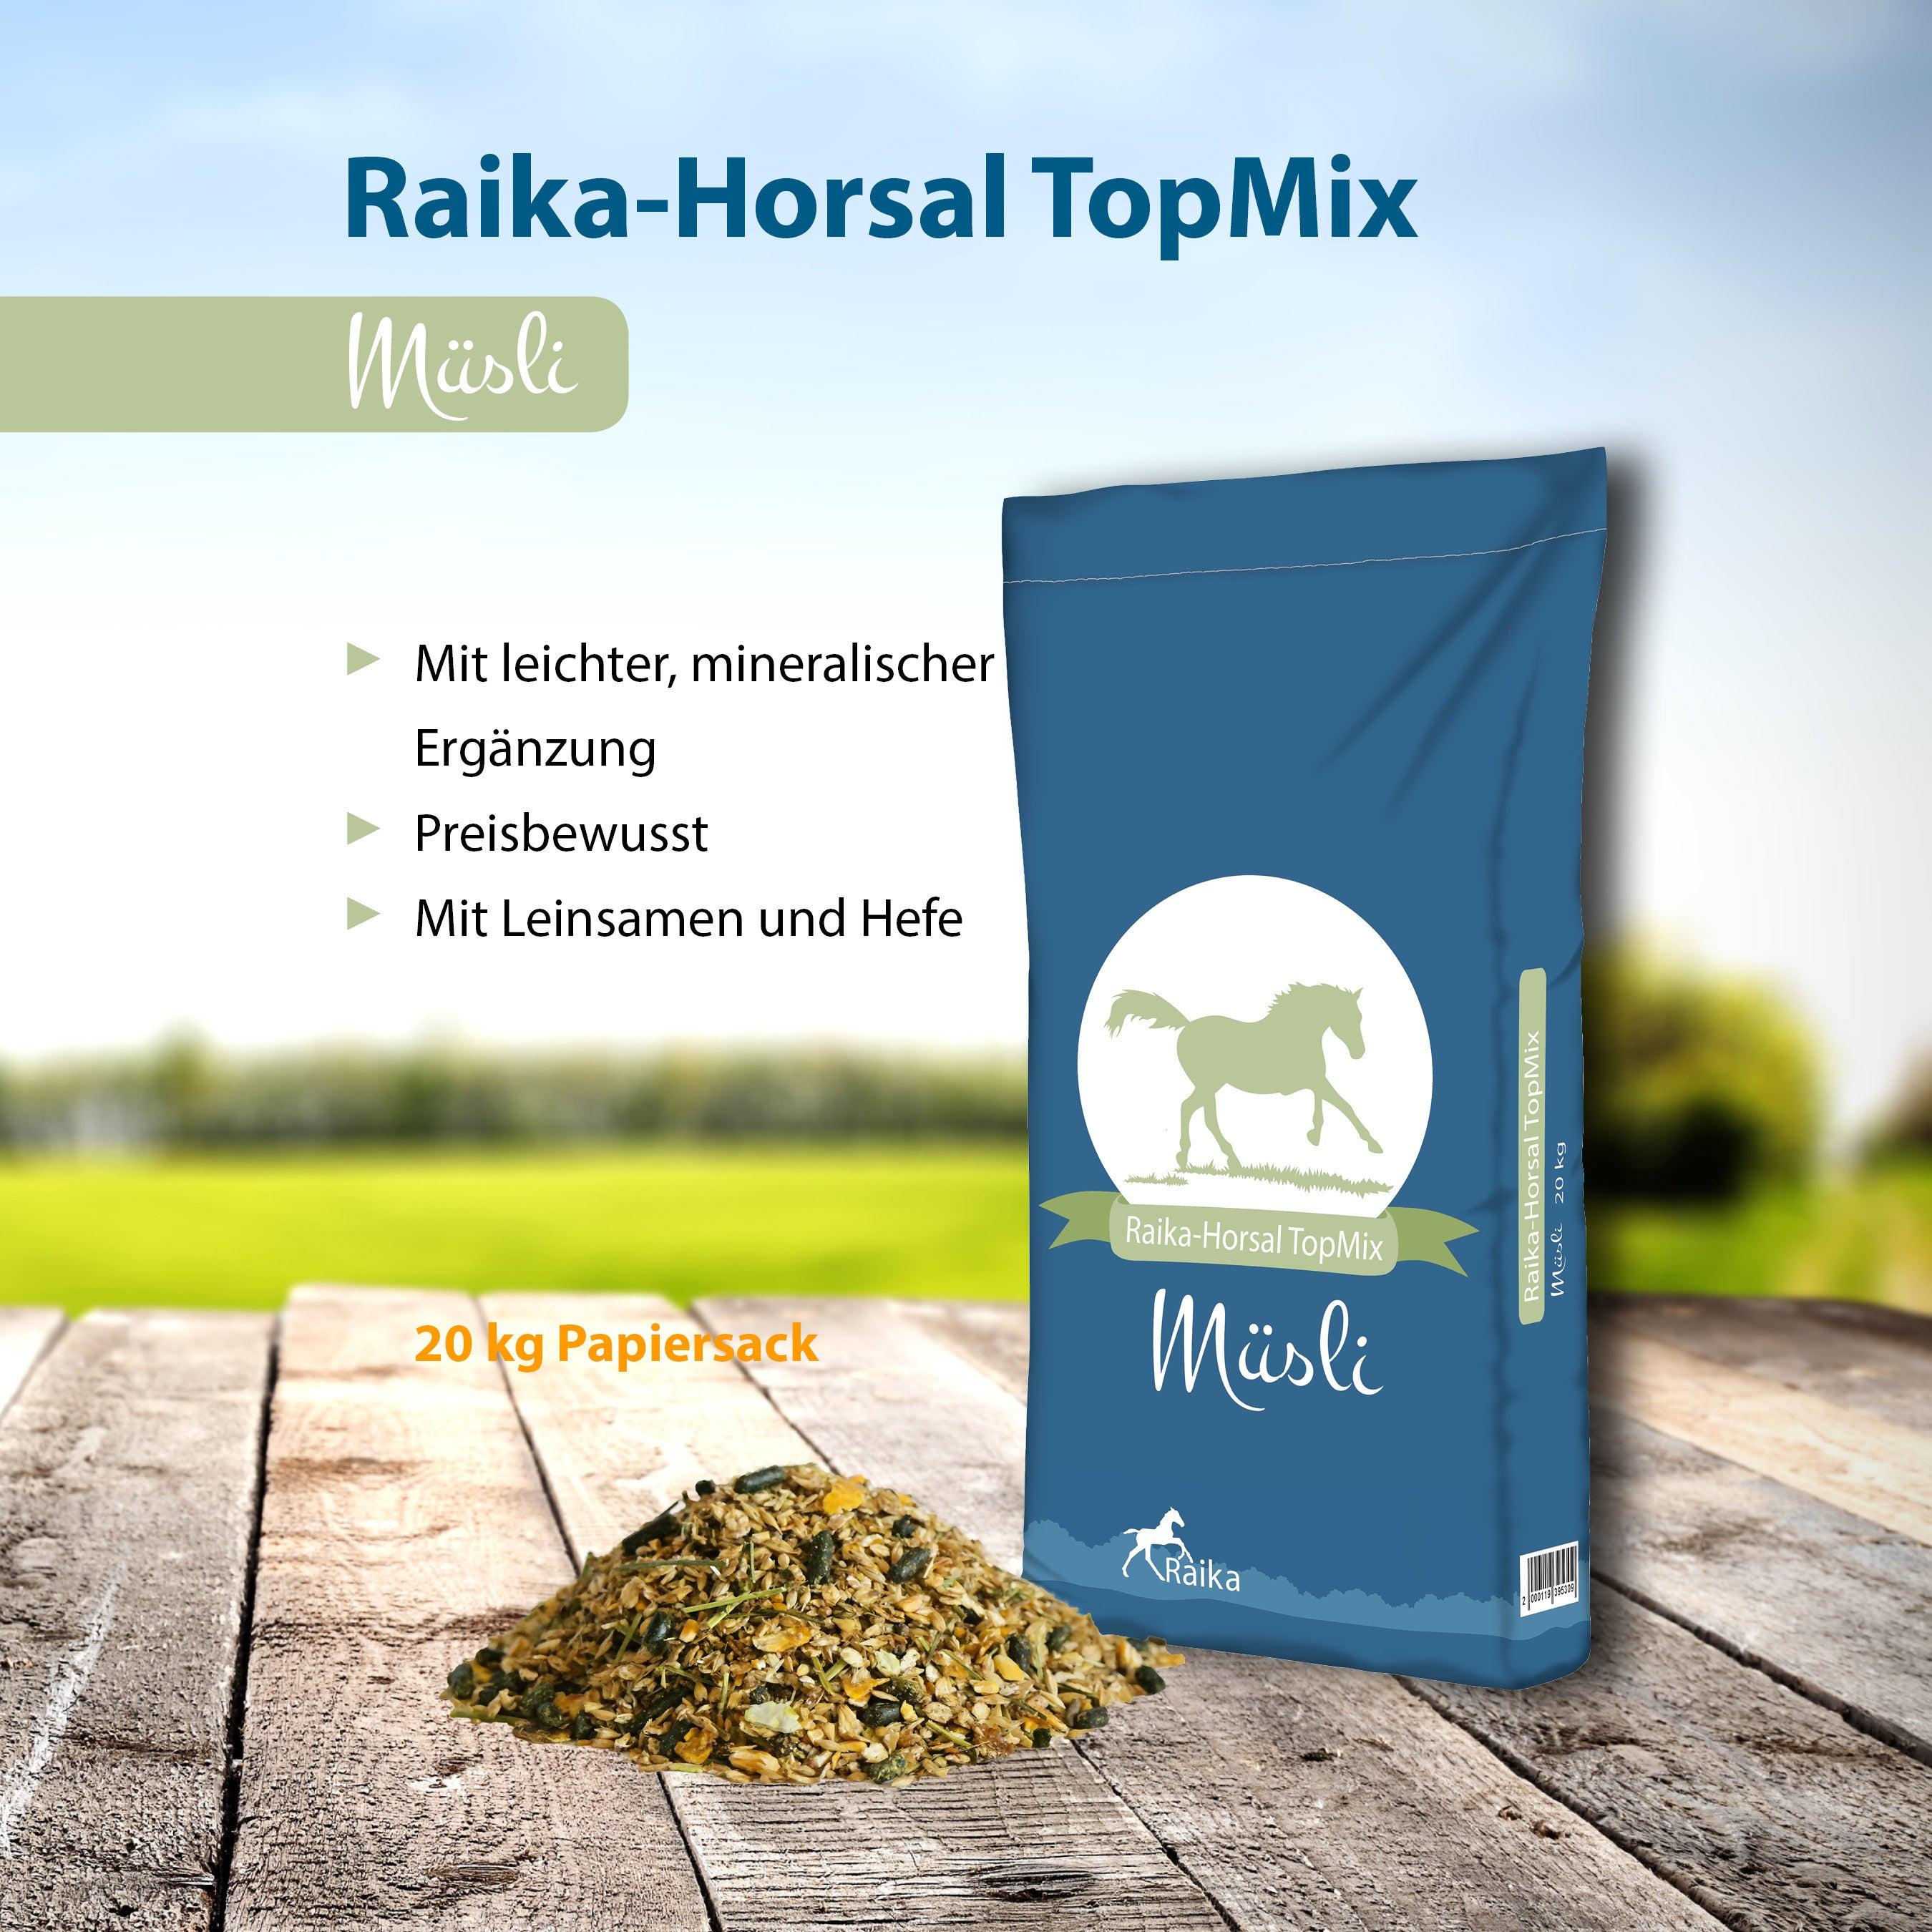 Raika-Horsal TopMix Müsli Pferdefutter